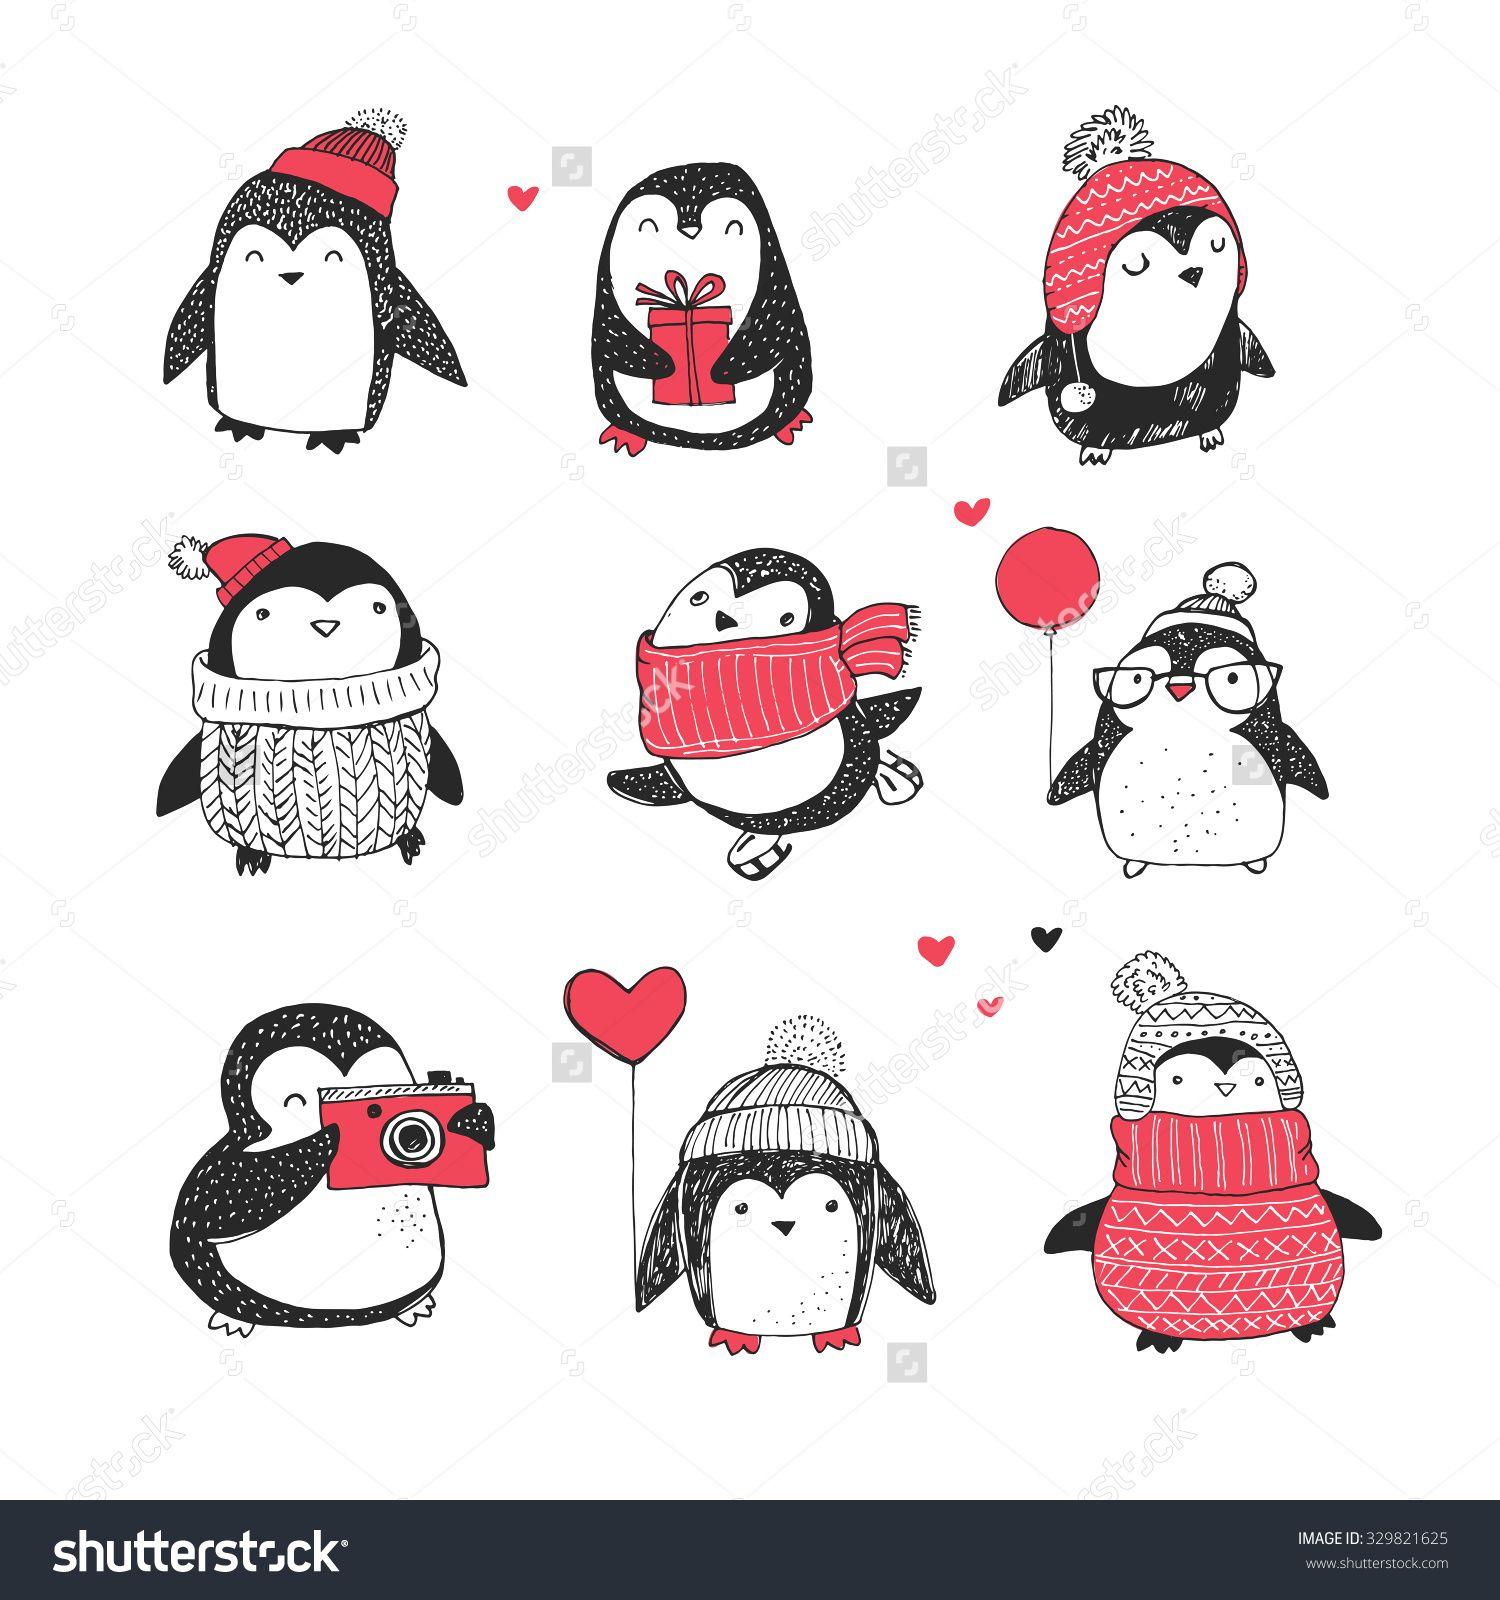 Cute Hand Drawn Penguins Set - Merry Christmas Greetings Stock Vector Illustration 329821625 ...